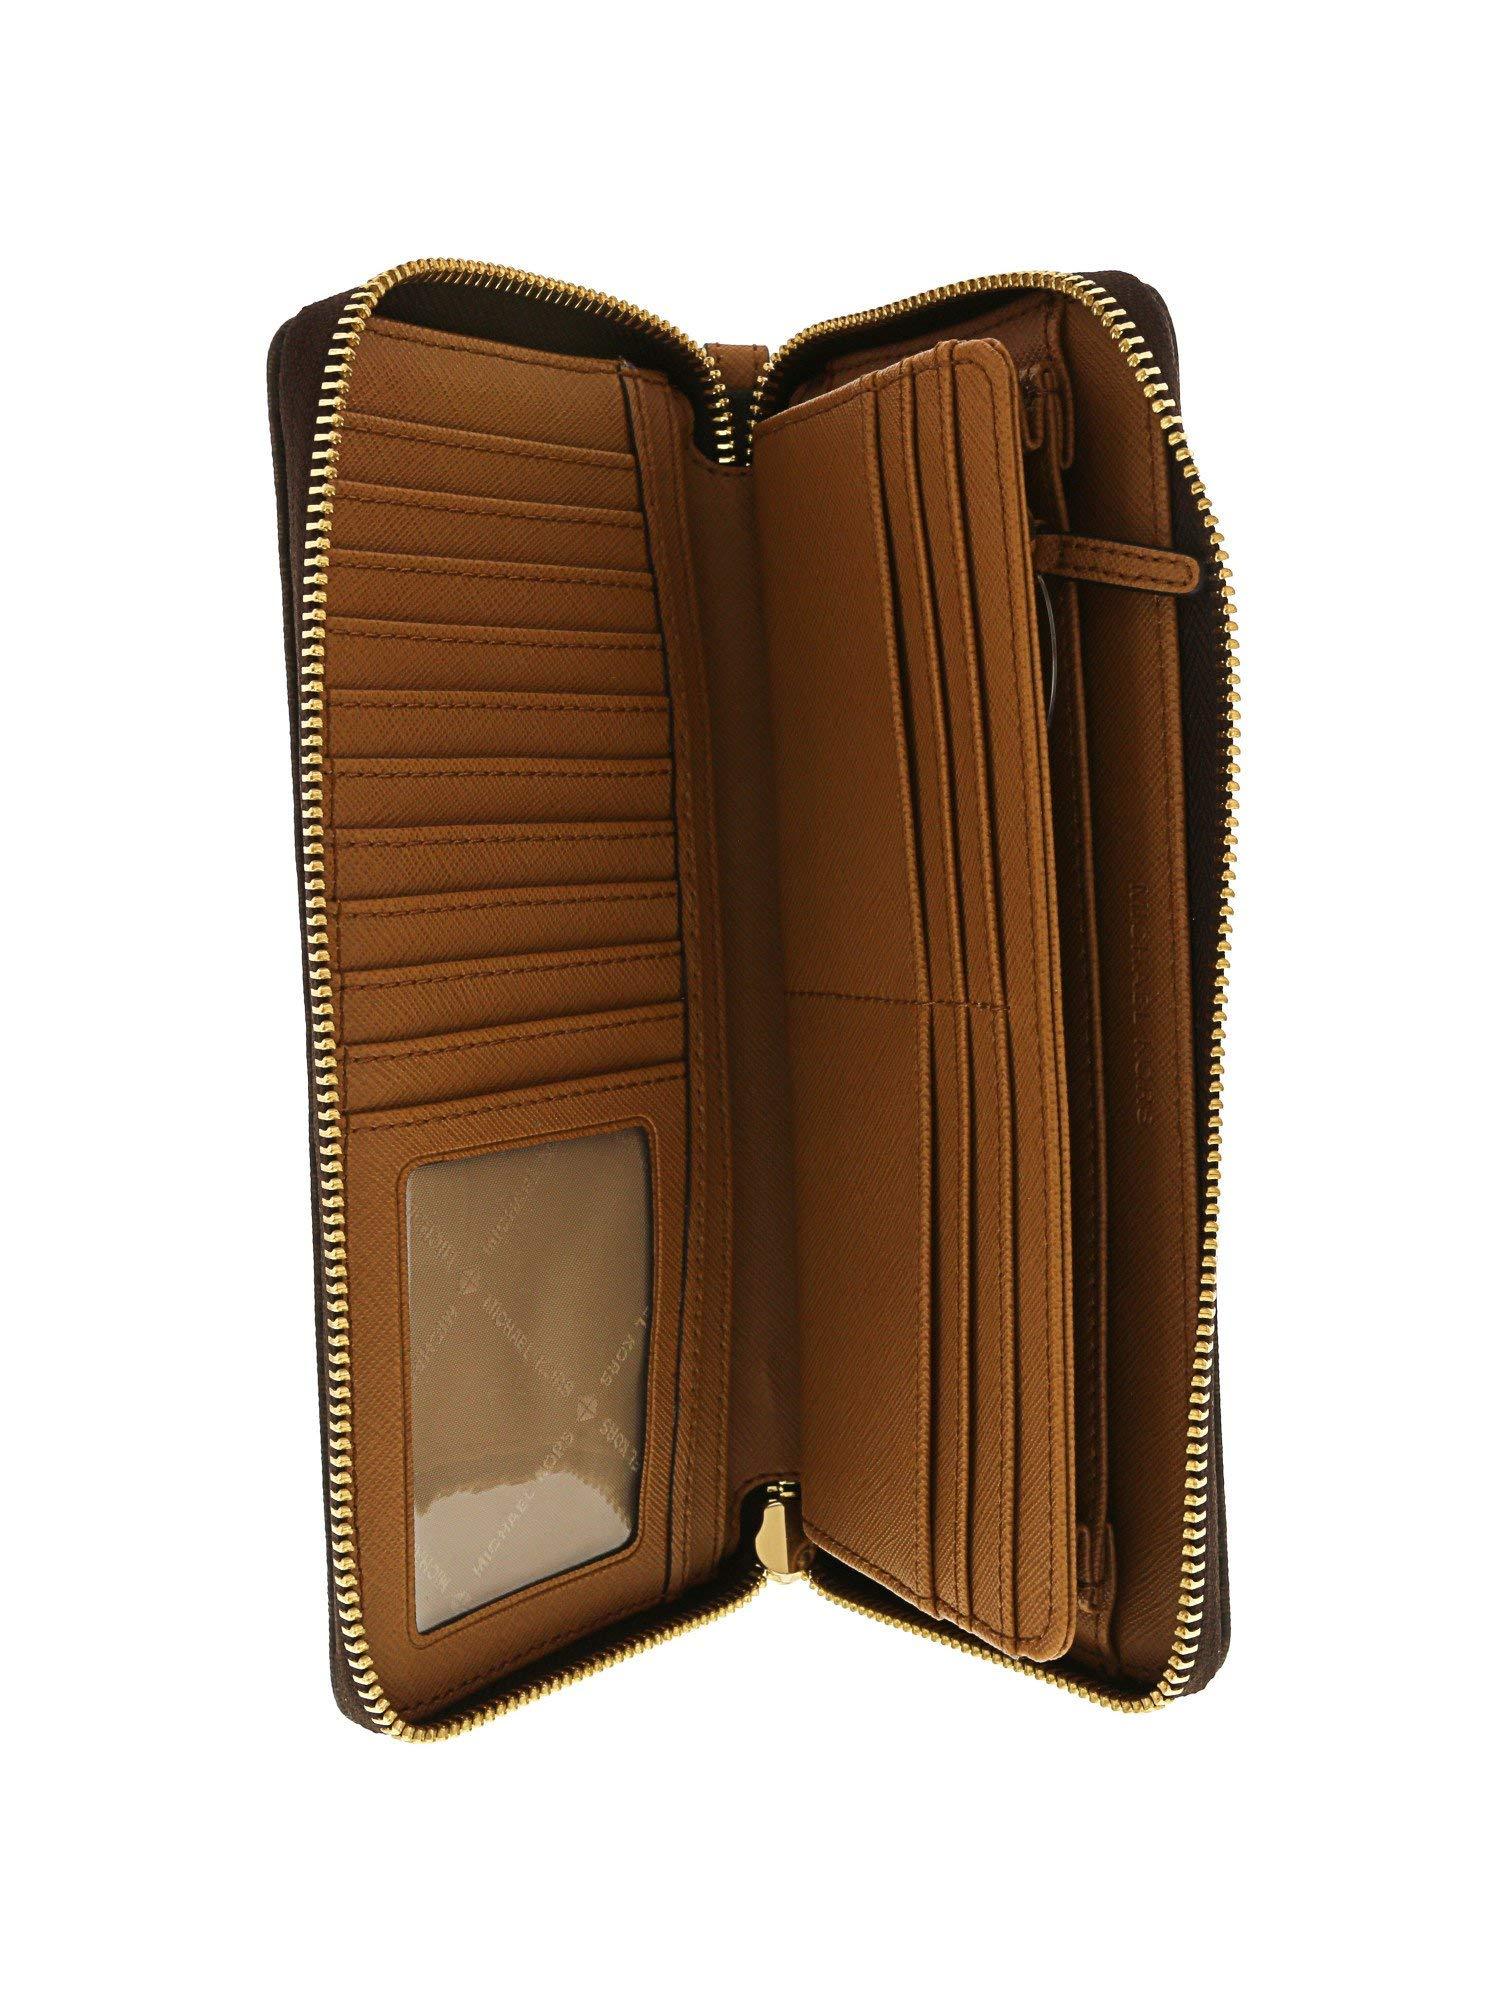 Michael Kors Women's Jet Set Travel Wallet No Size (Brown/Acorn) by Michael Kors